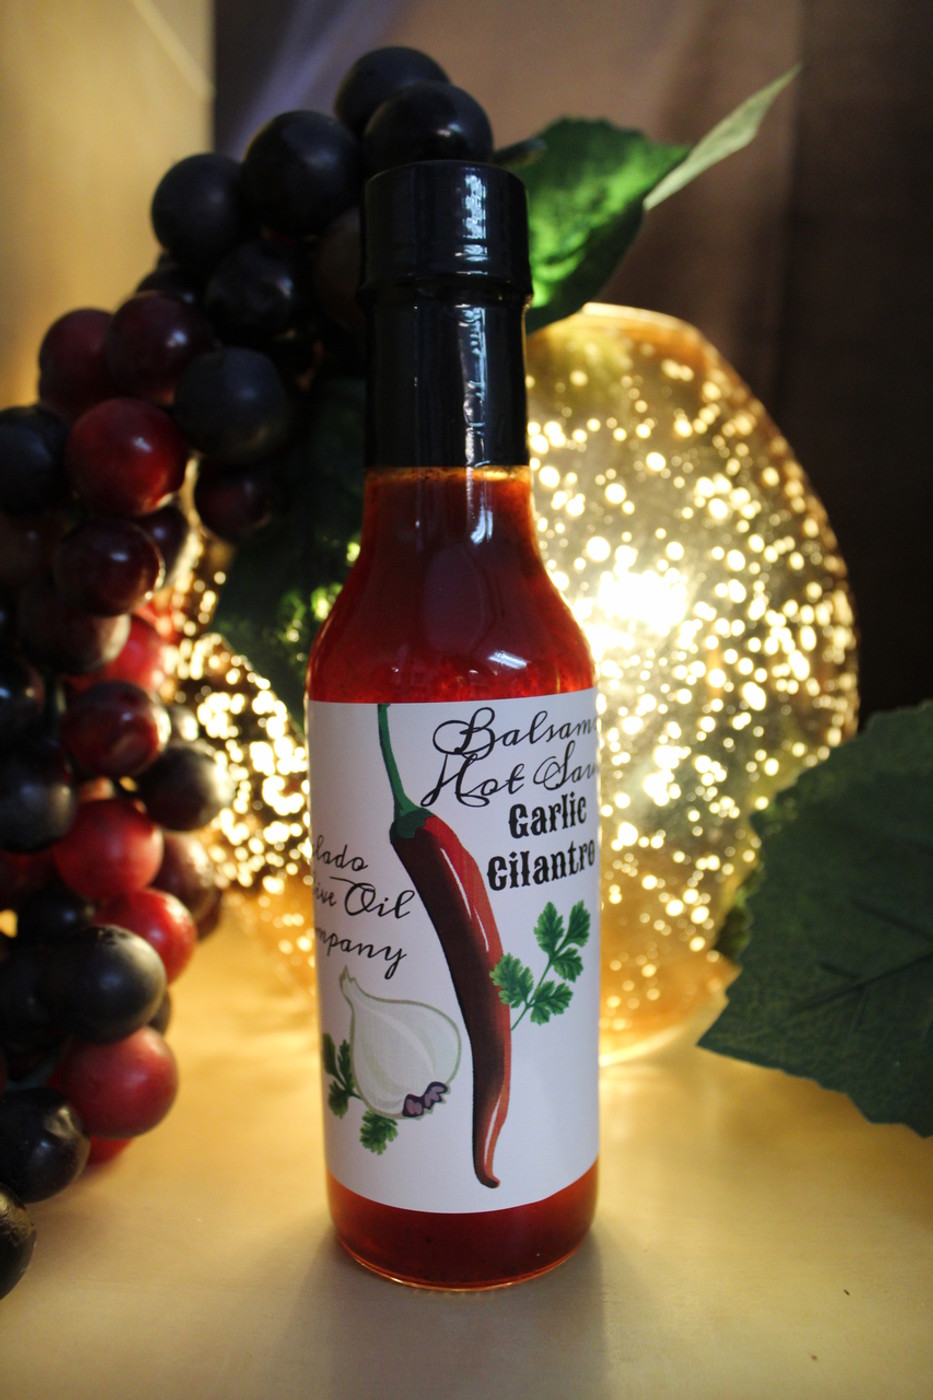 Garlic Cilantro Balsamic Hot Sauce